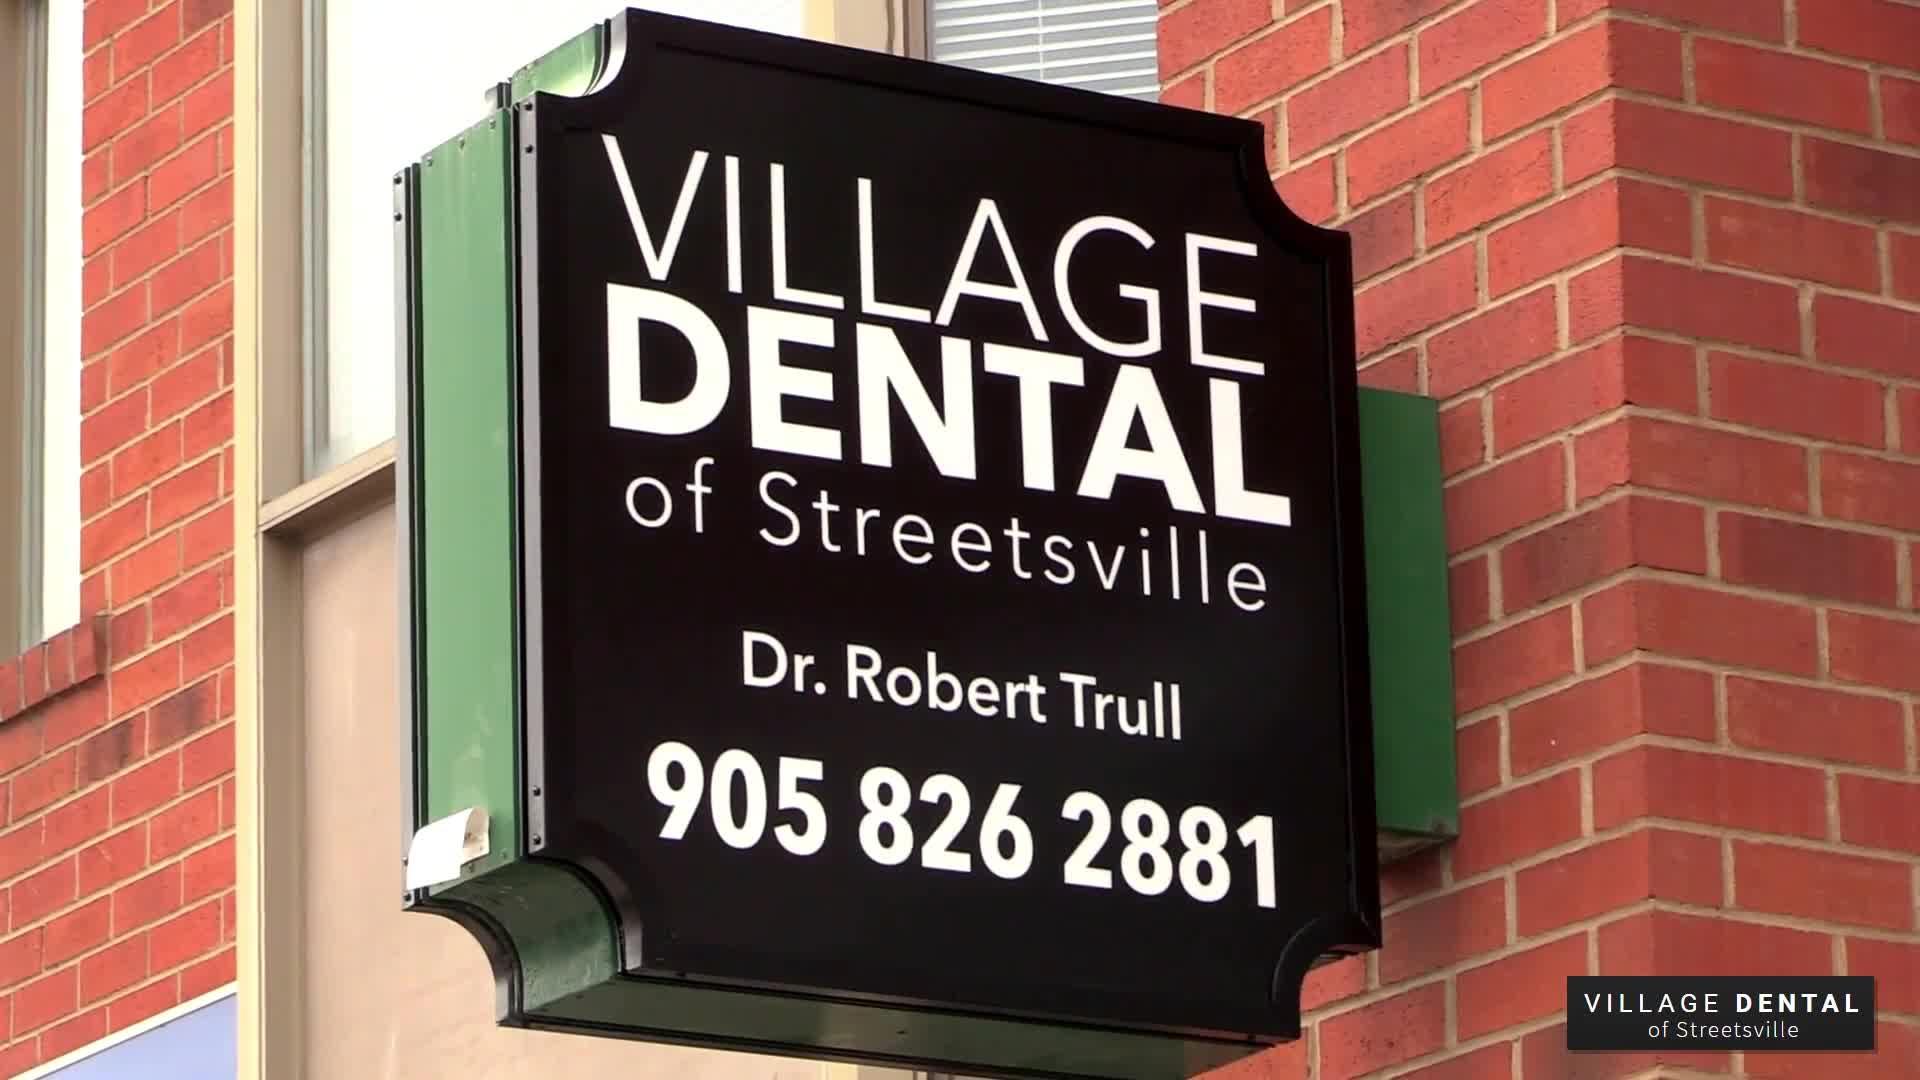 Trull Robert J Dr - Dentists - 9058262881